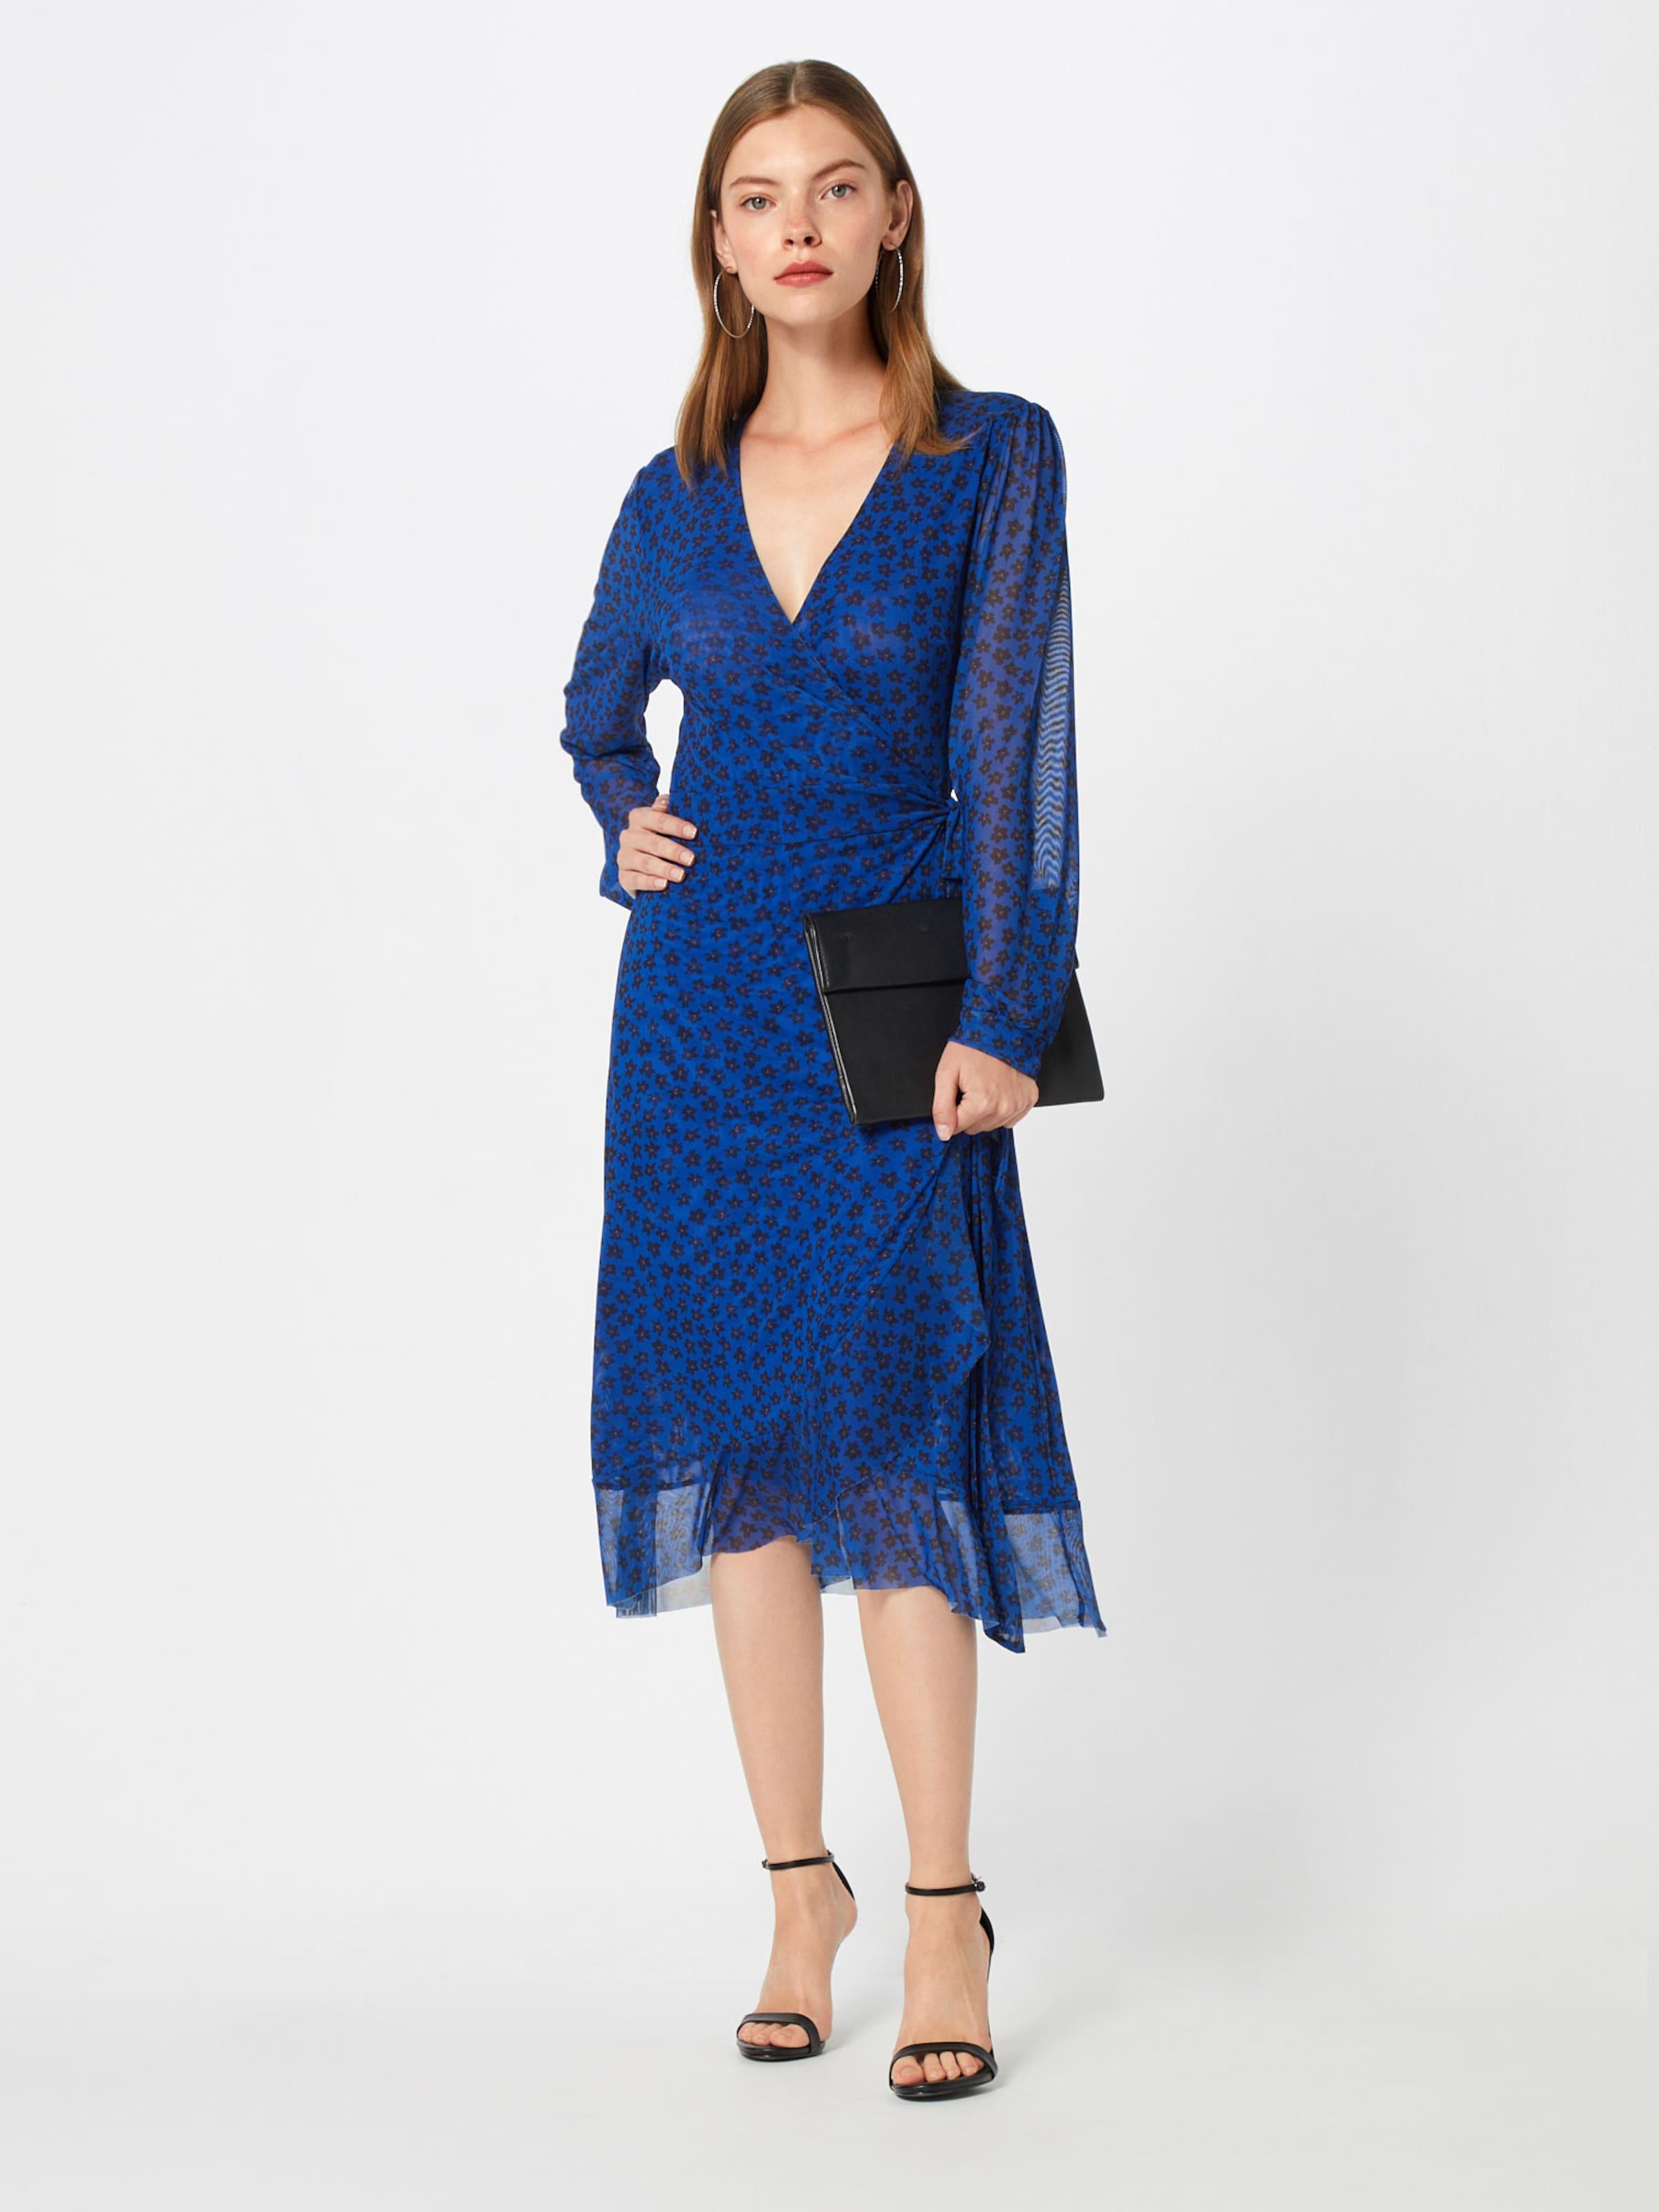 En Robe Bleu Soaked De RoiNoir Luxury Cocktail In lTKcF1J3